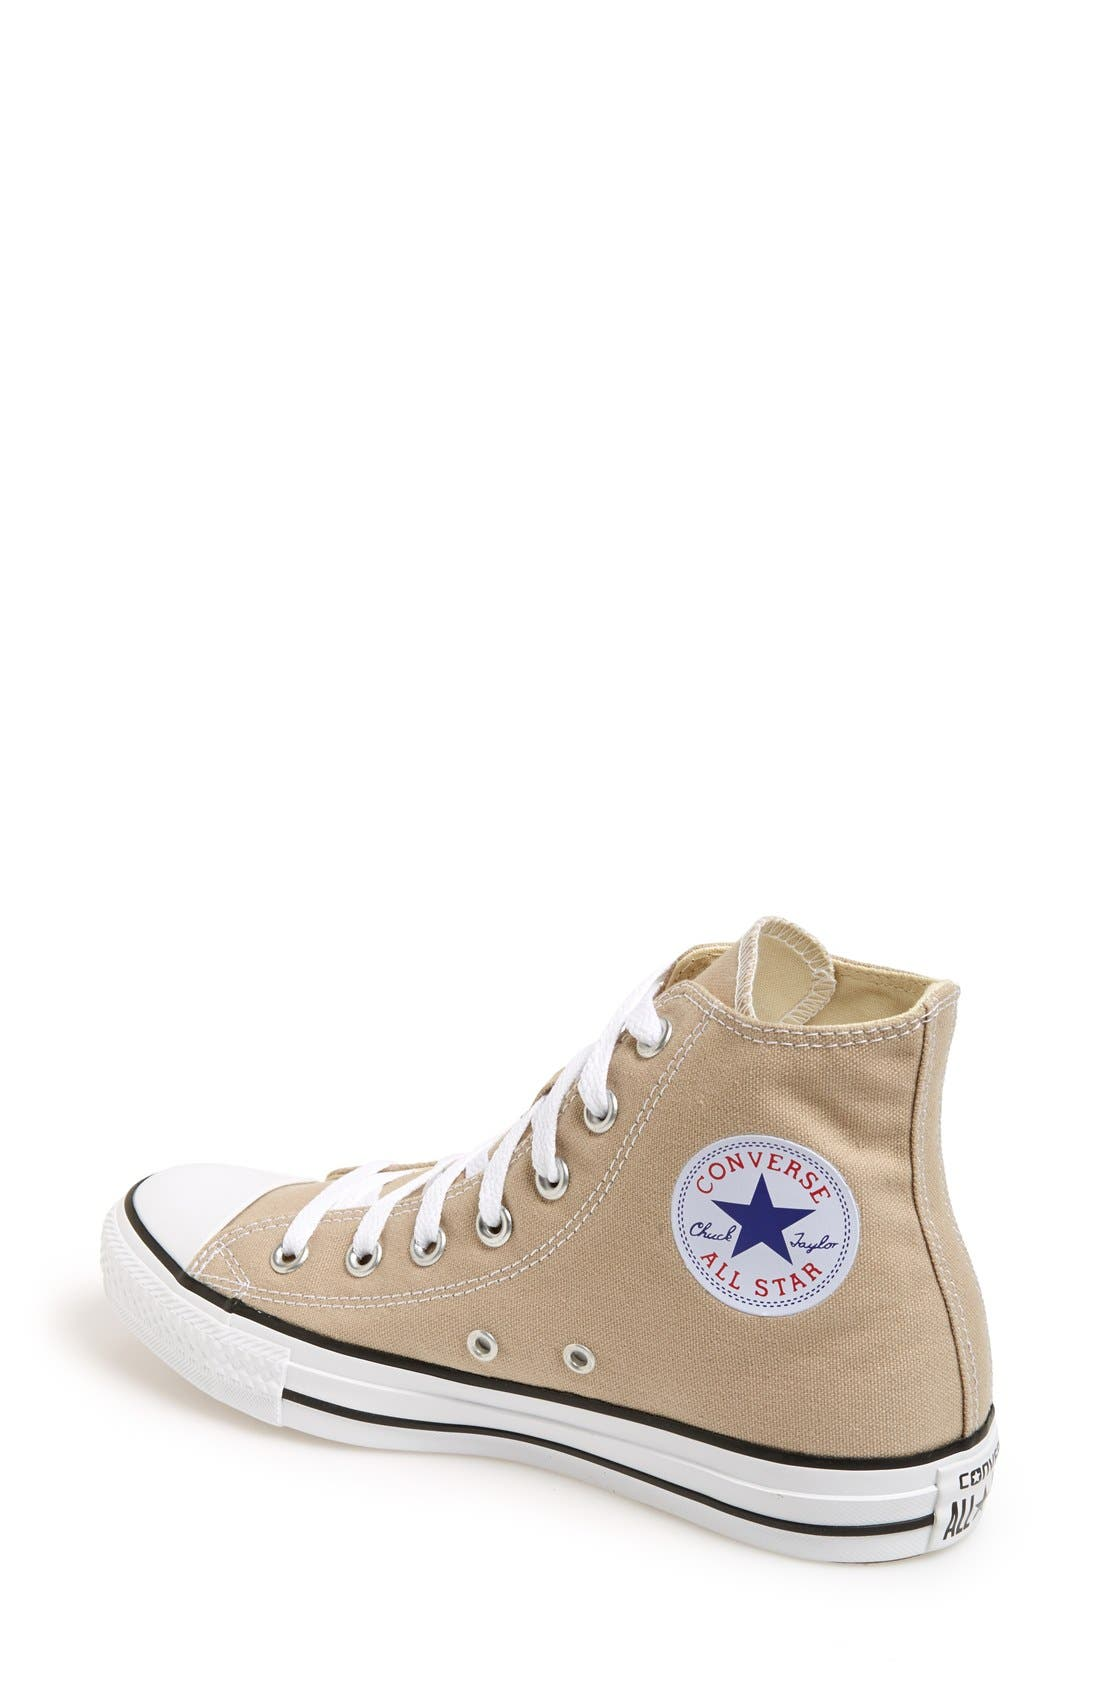 Alternate Image 2  - Converse Chuck Taylor® All Star®' Seasonal' High Top Sneaker (Women)